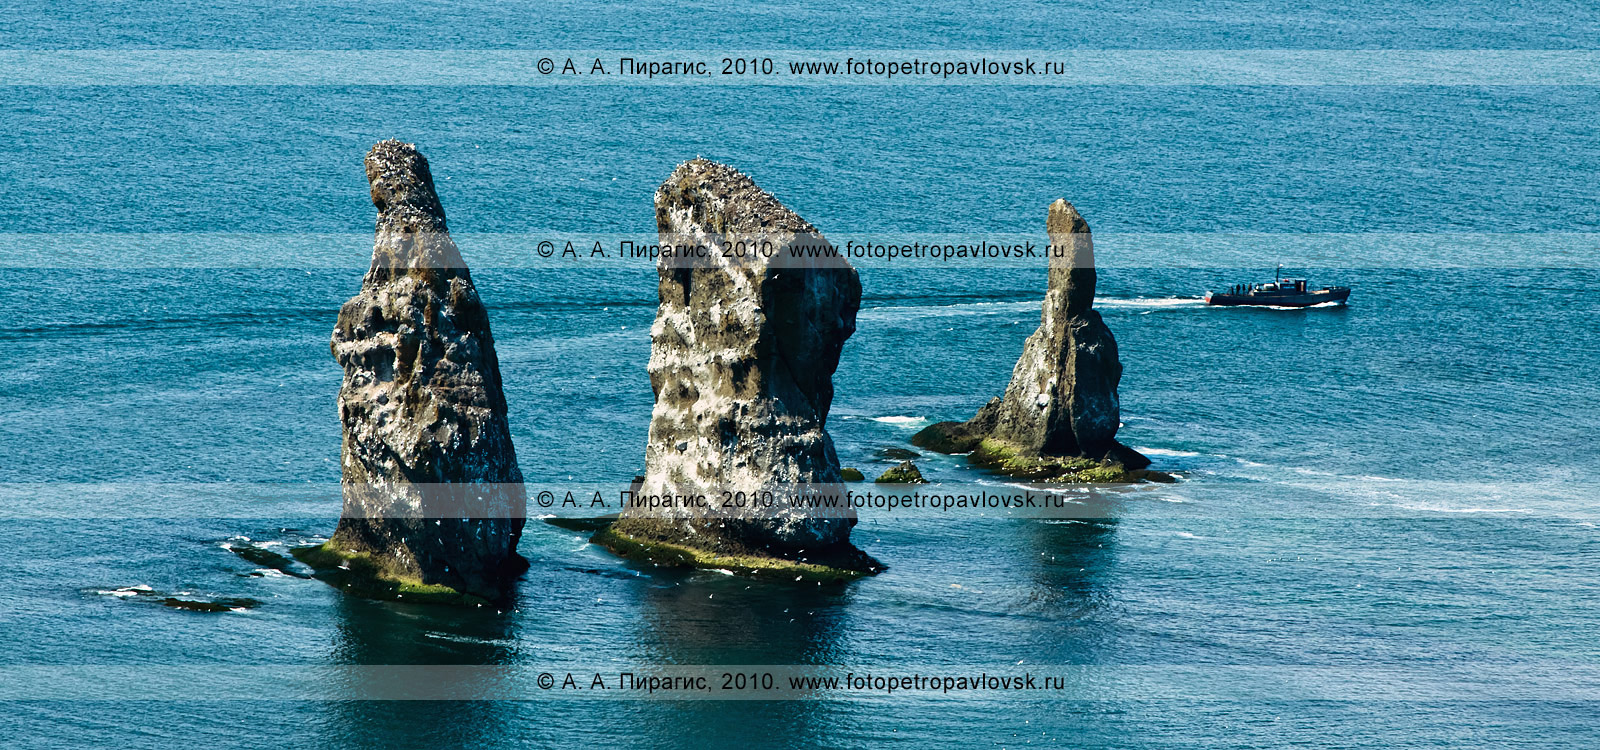 Скалы Три Брата — памятник природы Камчатки